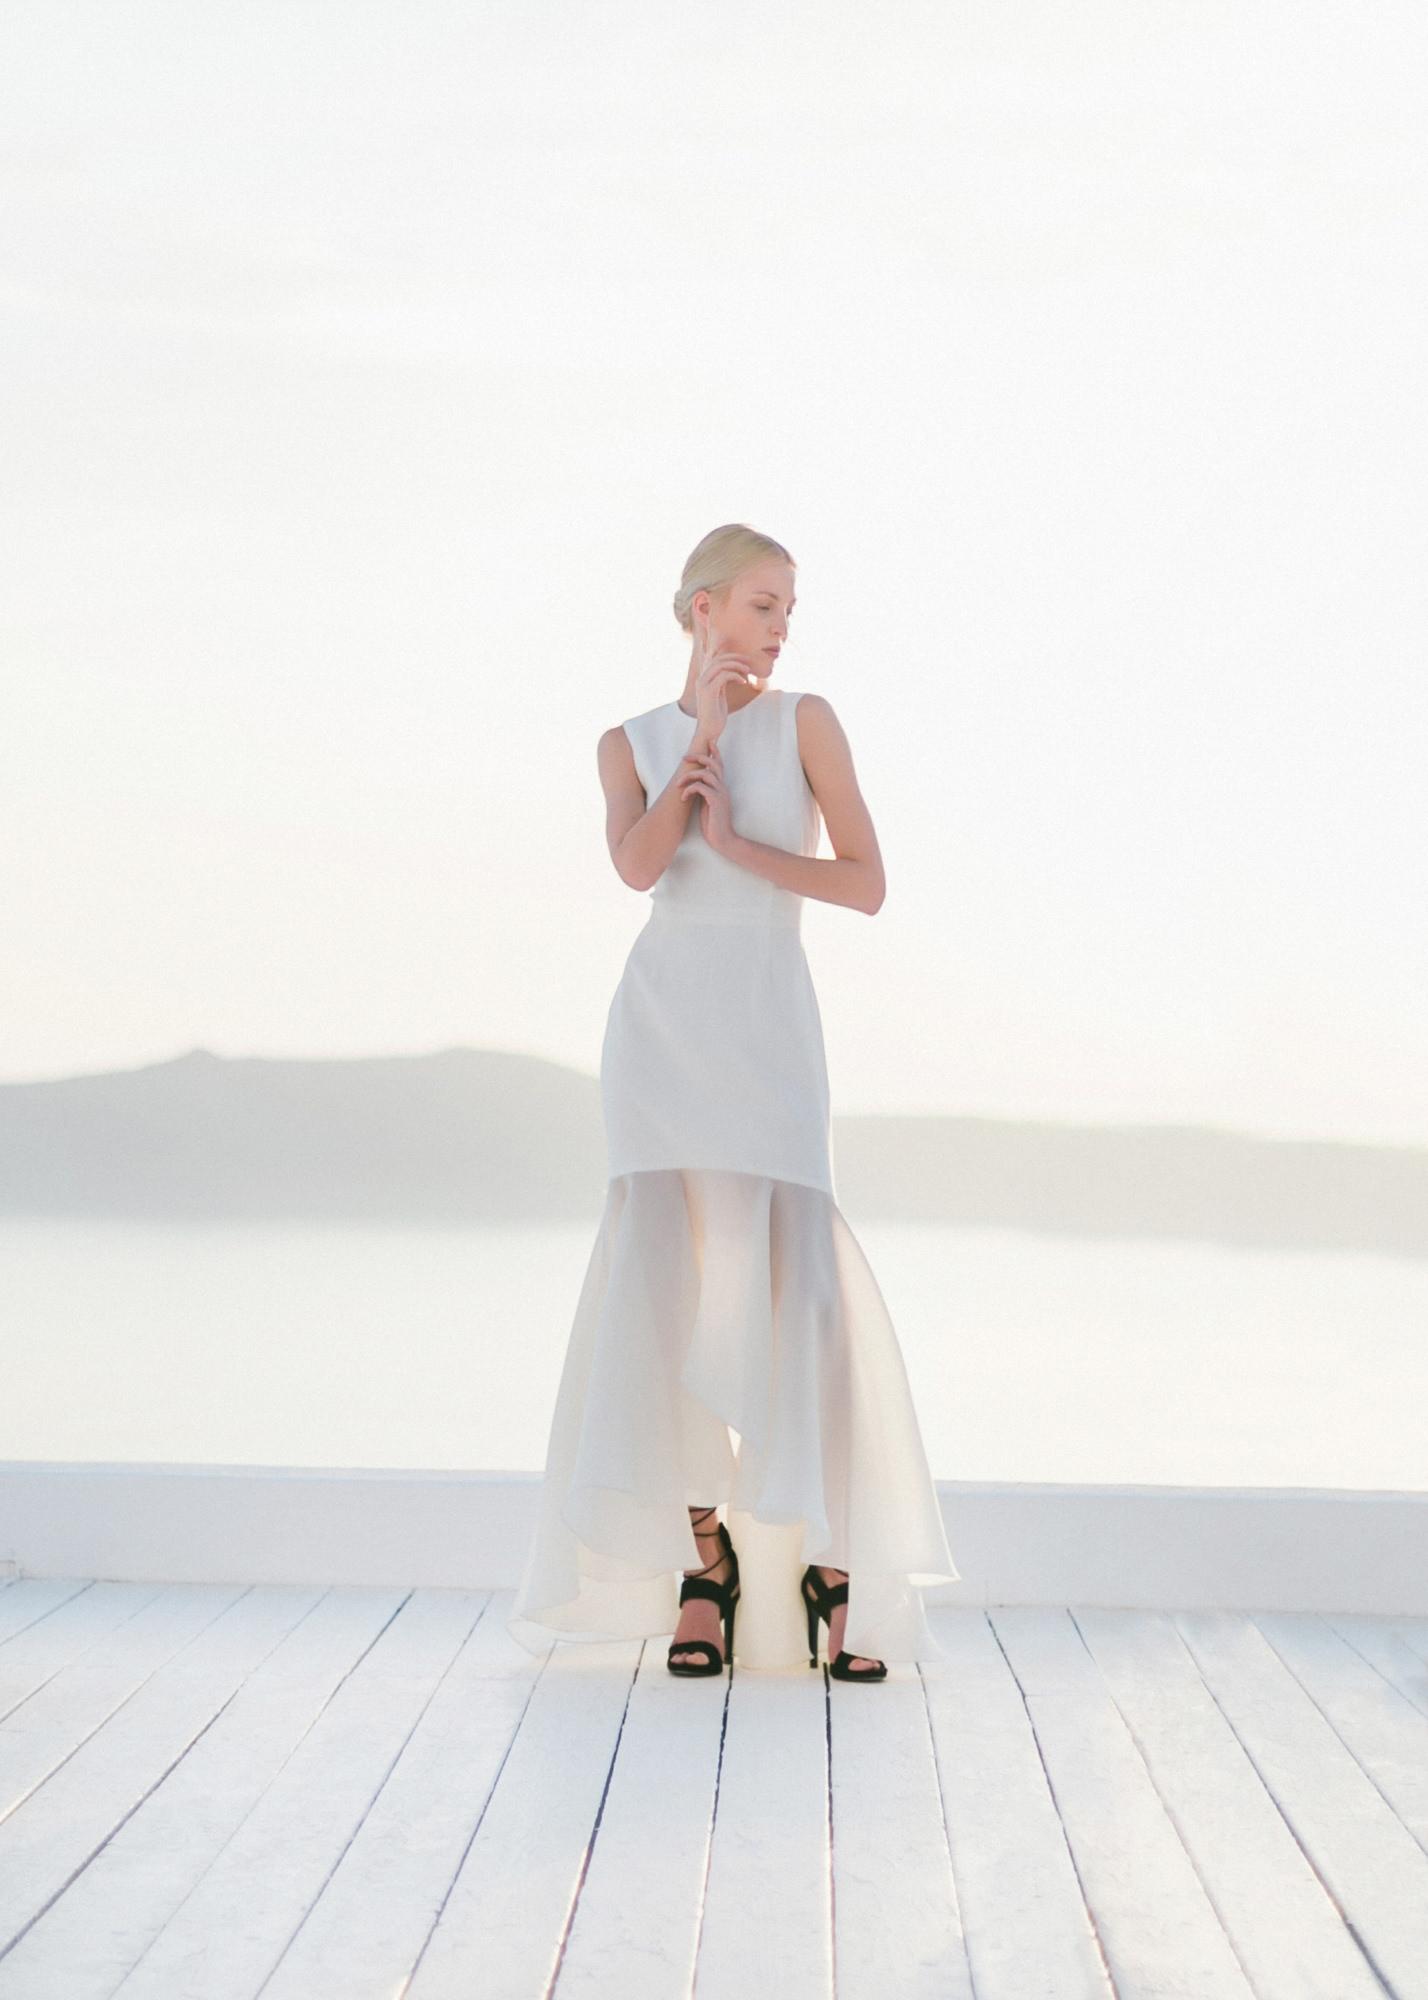 60-portrait-santorini-wedding-photographer-greece-b-v